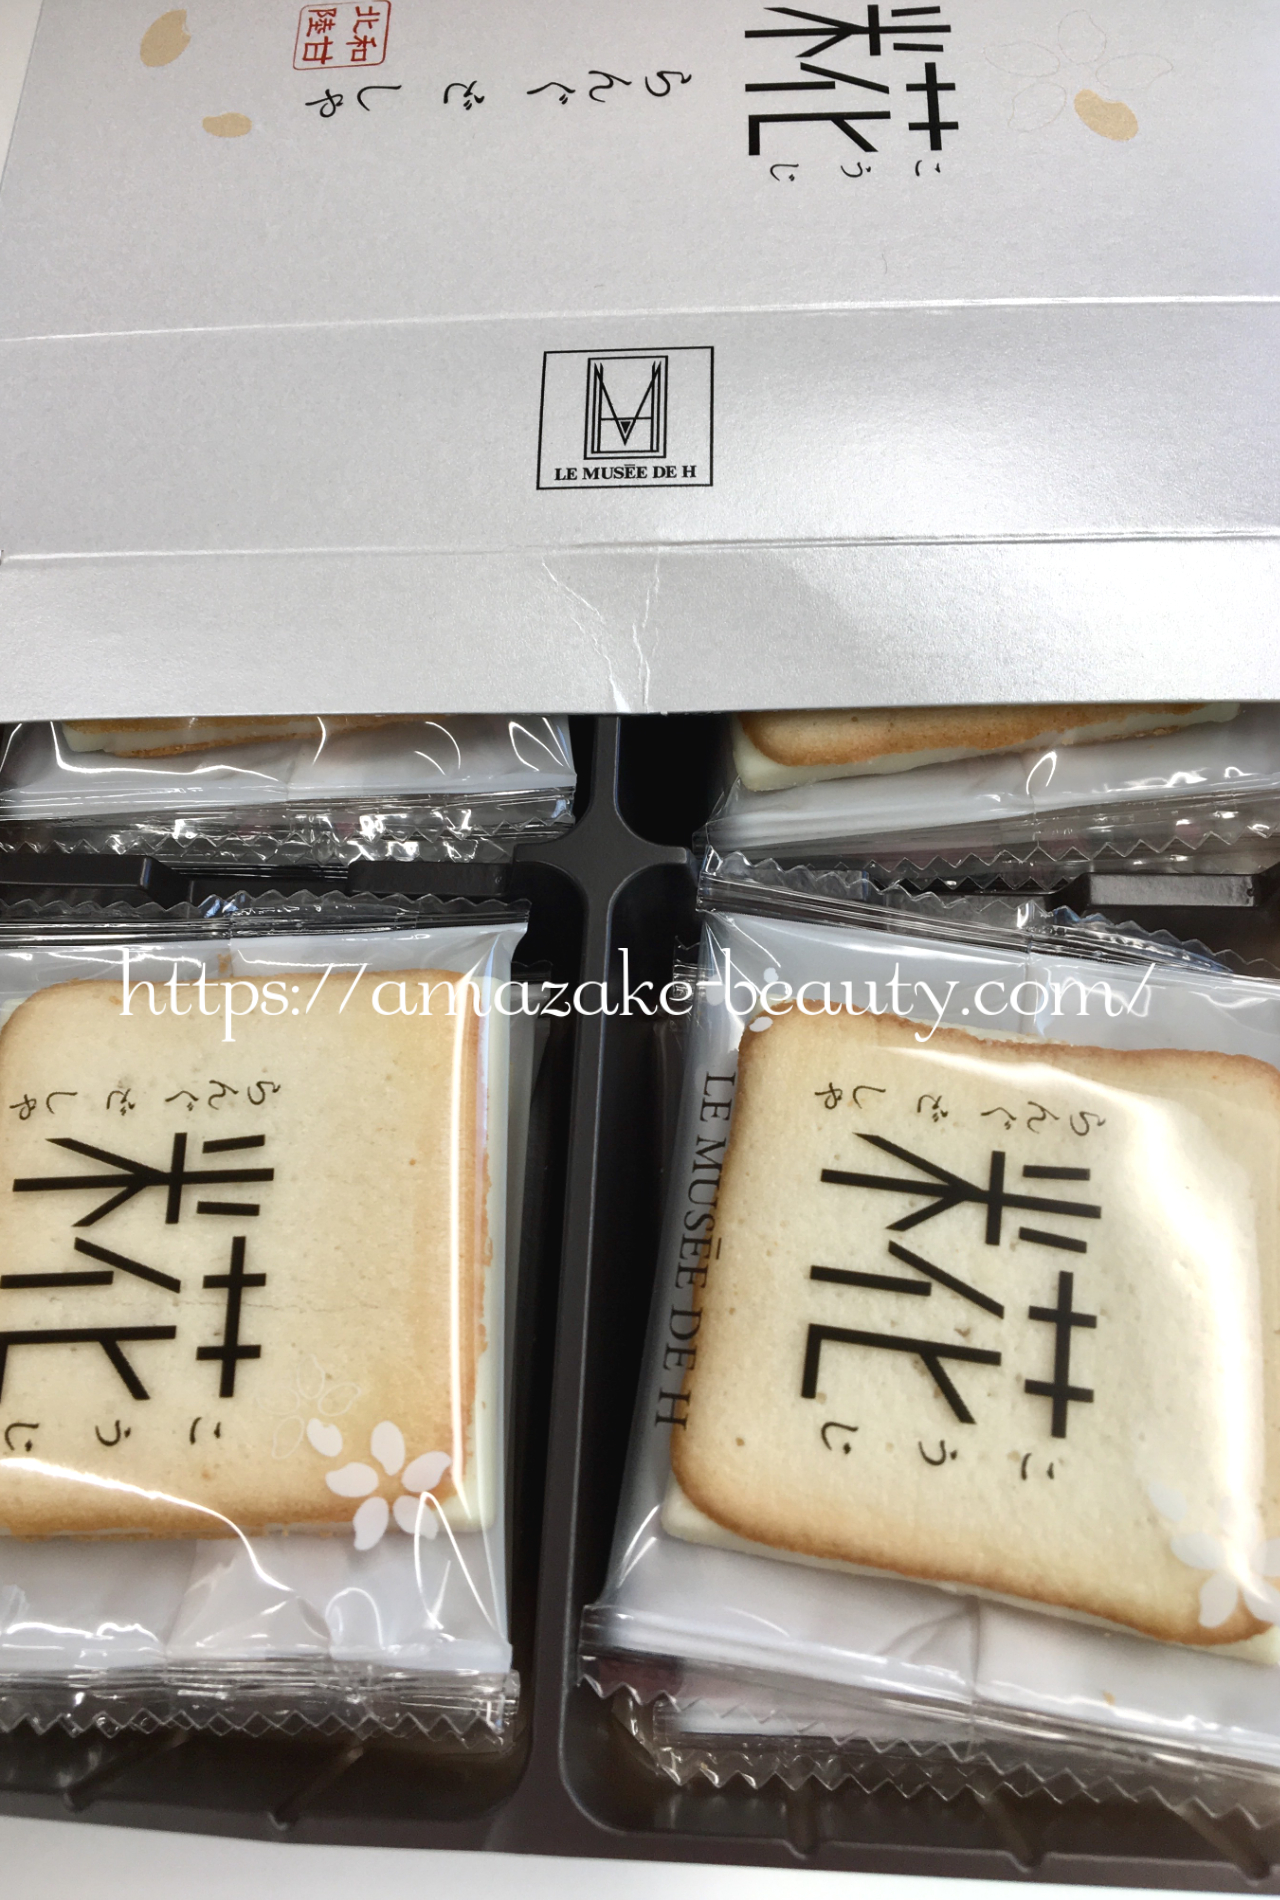 [amazake sweets]ru myuze do asshu[koji rangudosha]